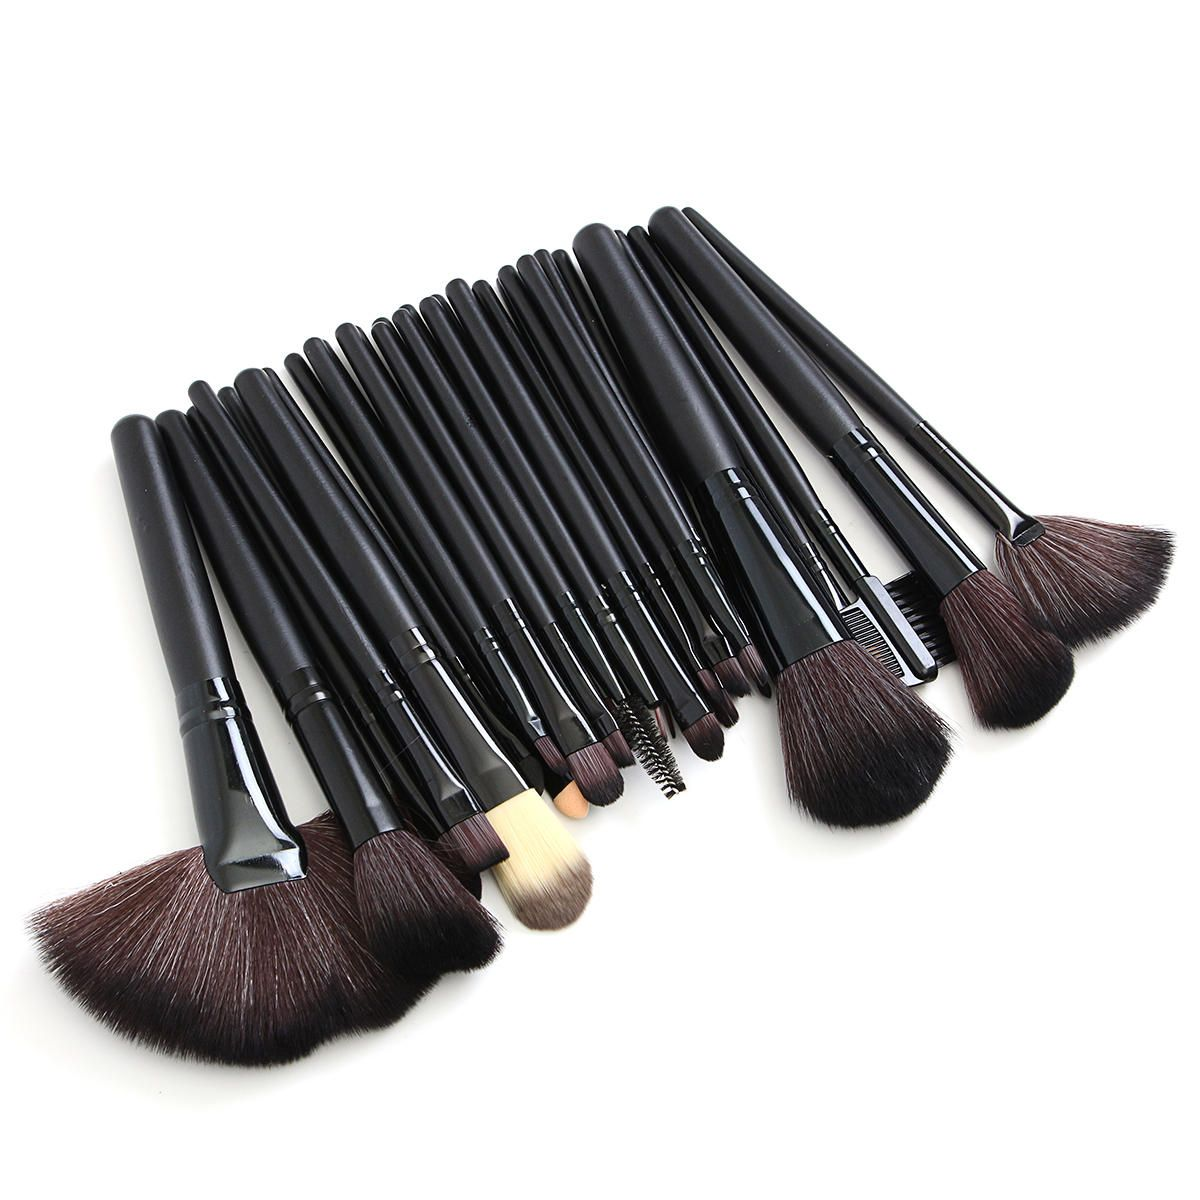 32pcs Pink Eyeshadow Eyebrow Blush Makeup Brushes Cosmetic Tools Set Soft